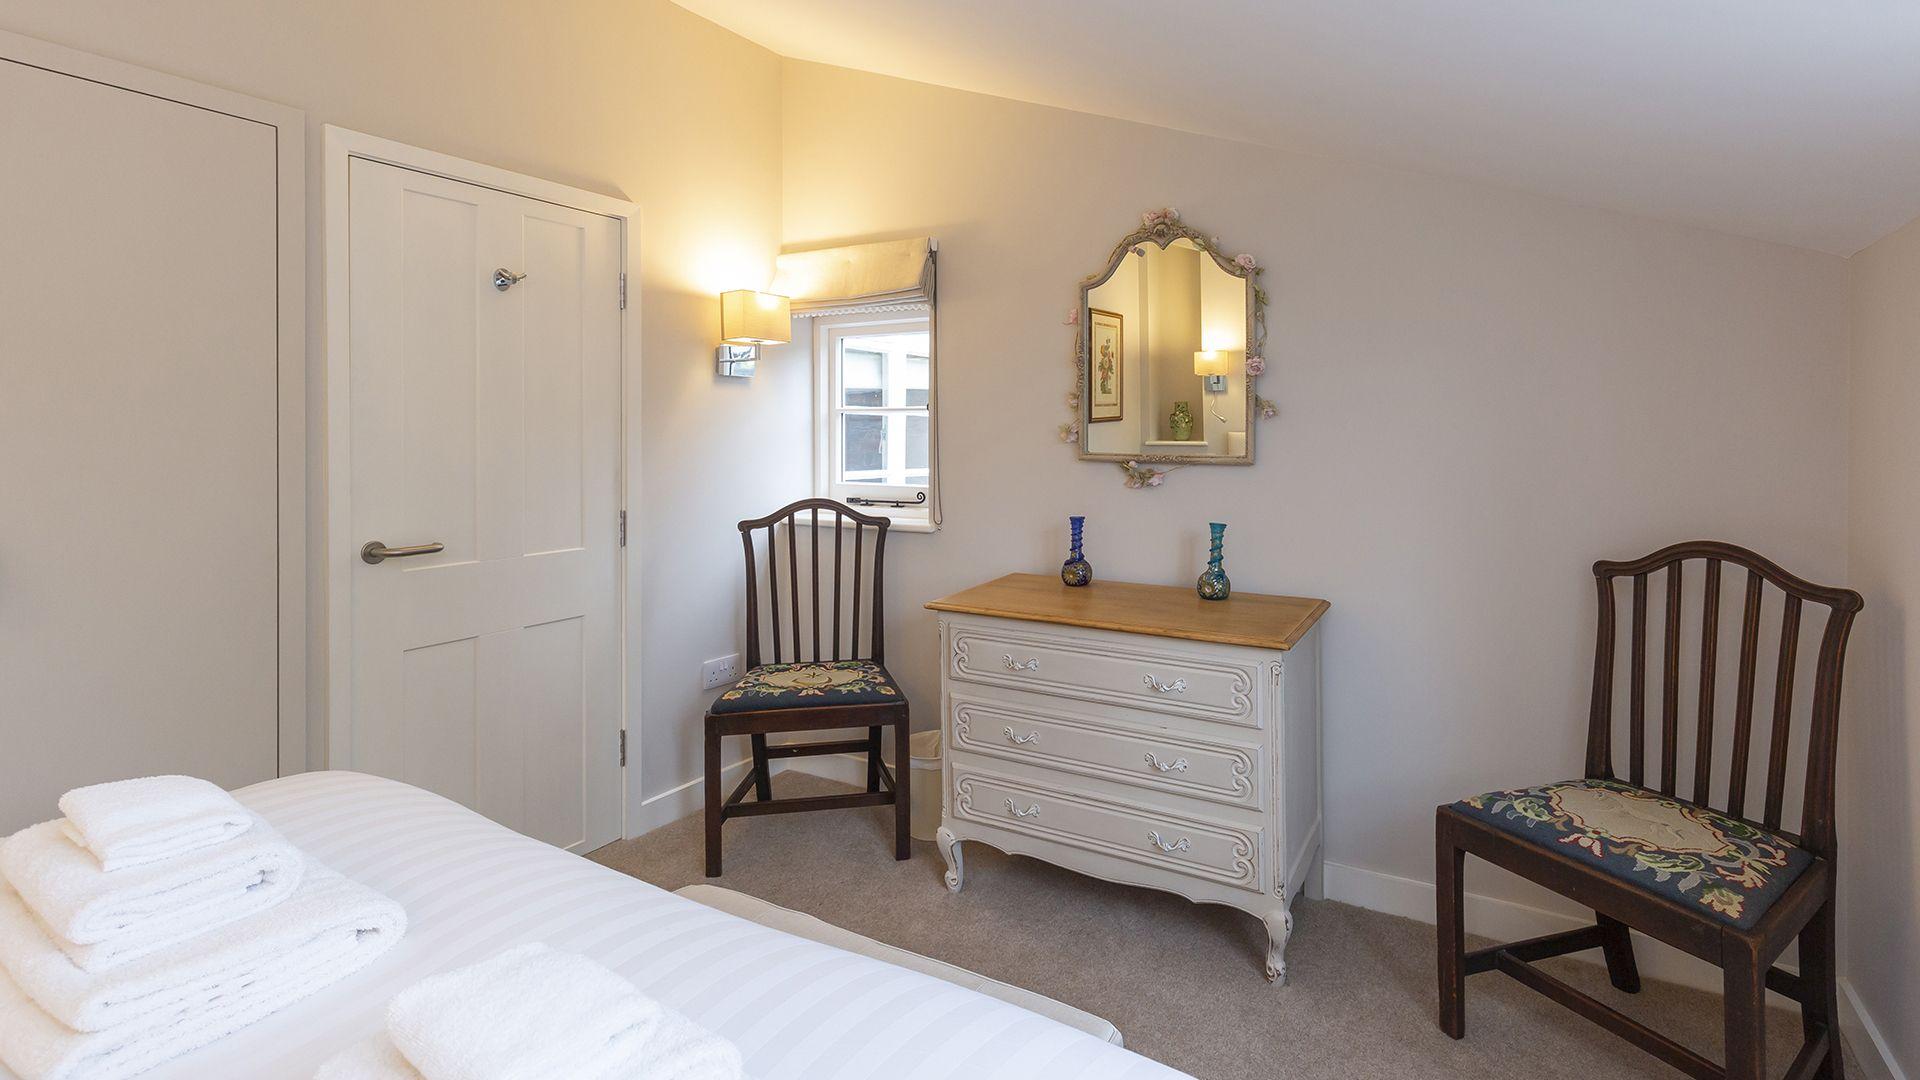 Master bedroom with views over garden, 14 Vineyard Street, Bolthole Retreats